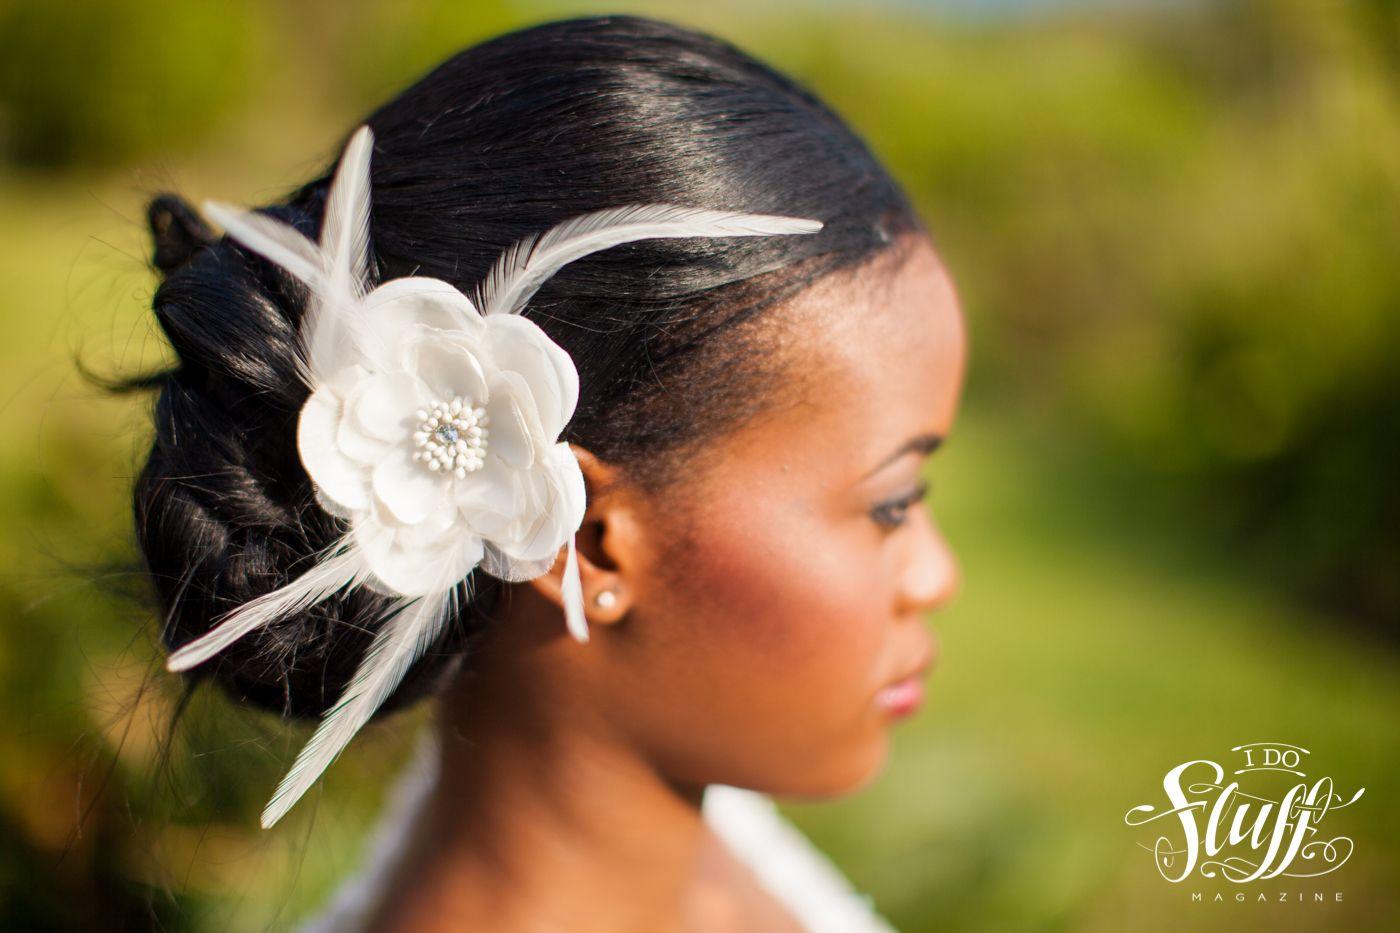 hair by lisa's full service salon, kingston, jamaica